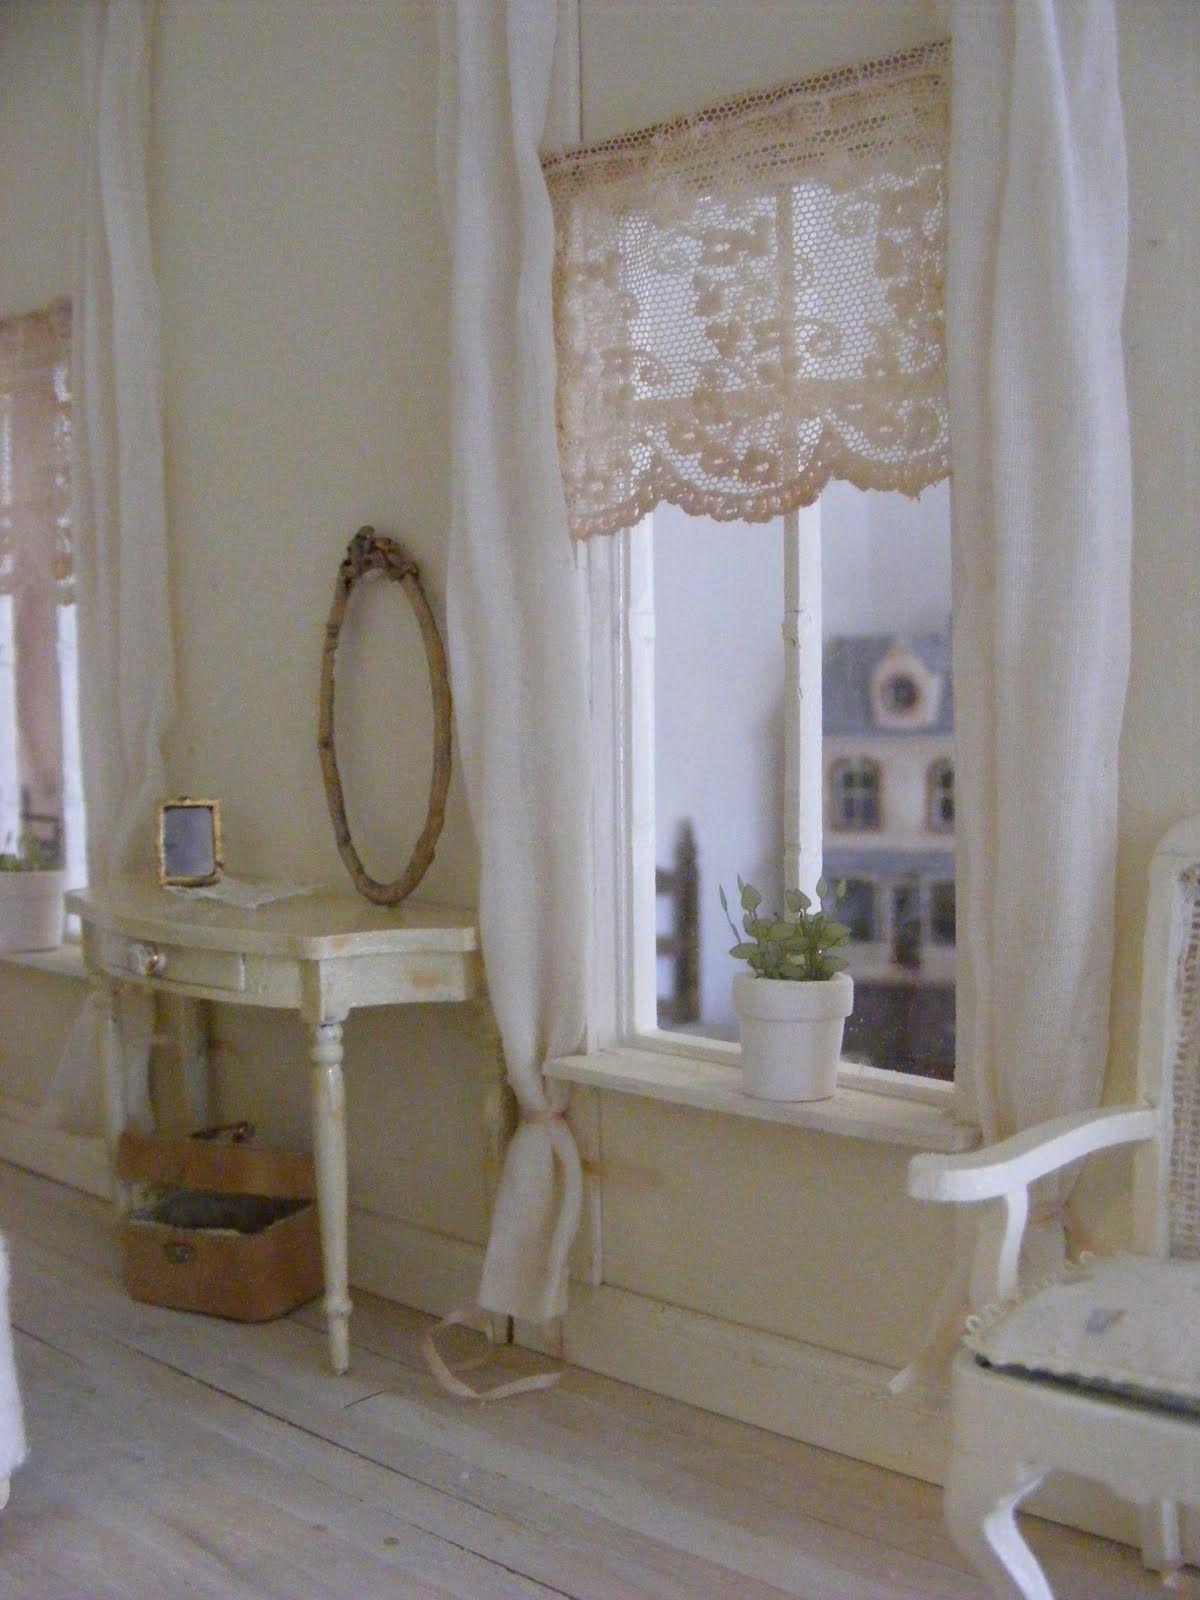 Lace in the window - Dollhouse Victoriaans Marmod Poppenhuis ...